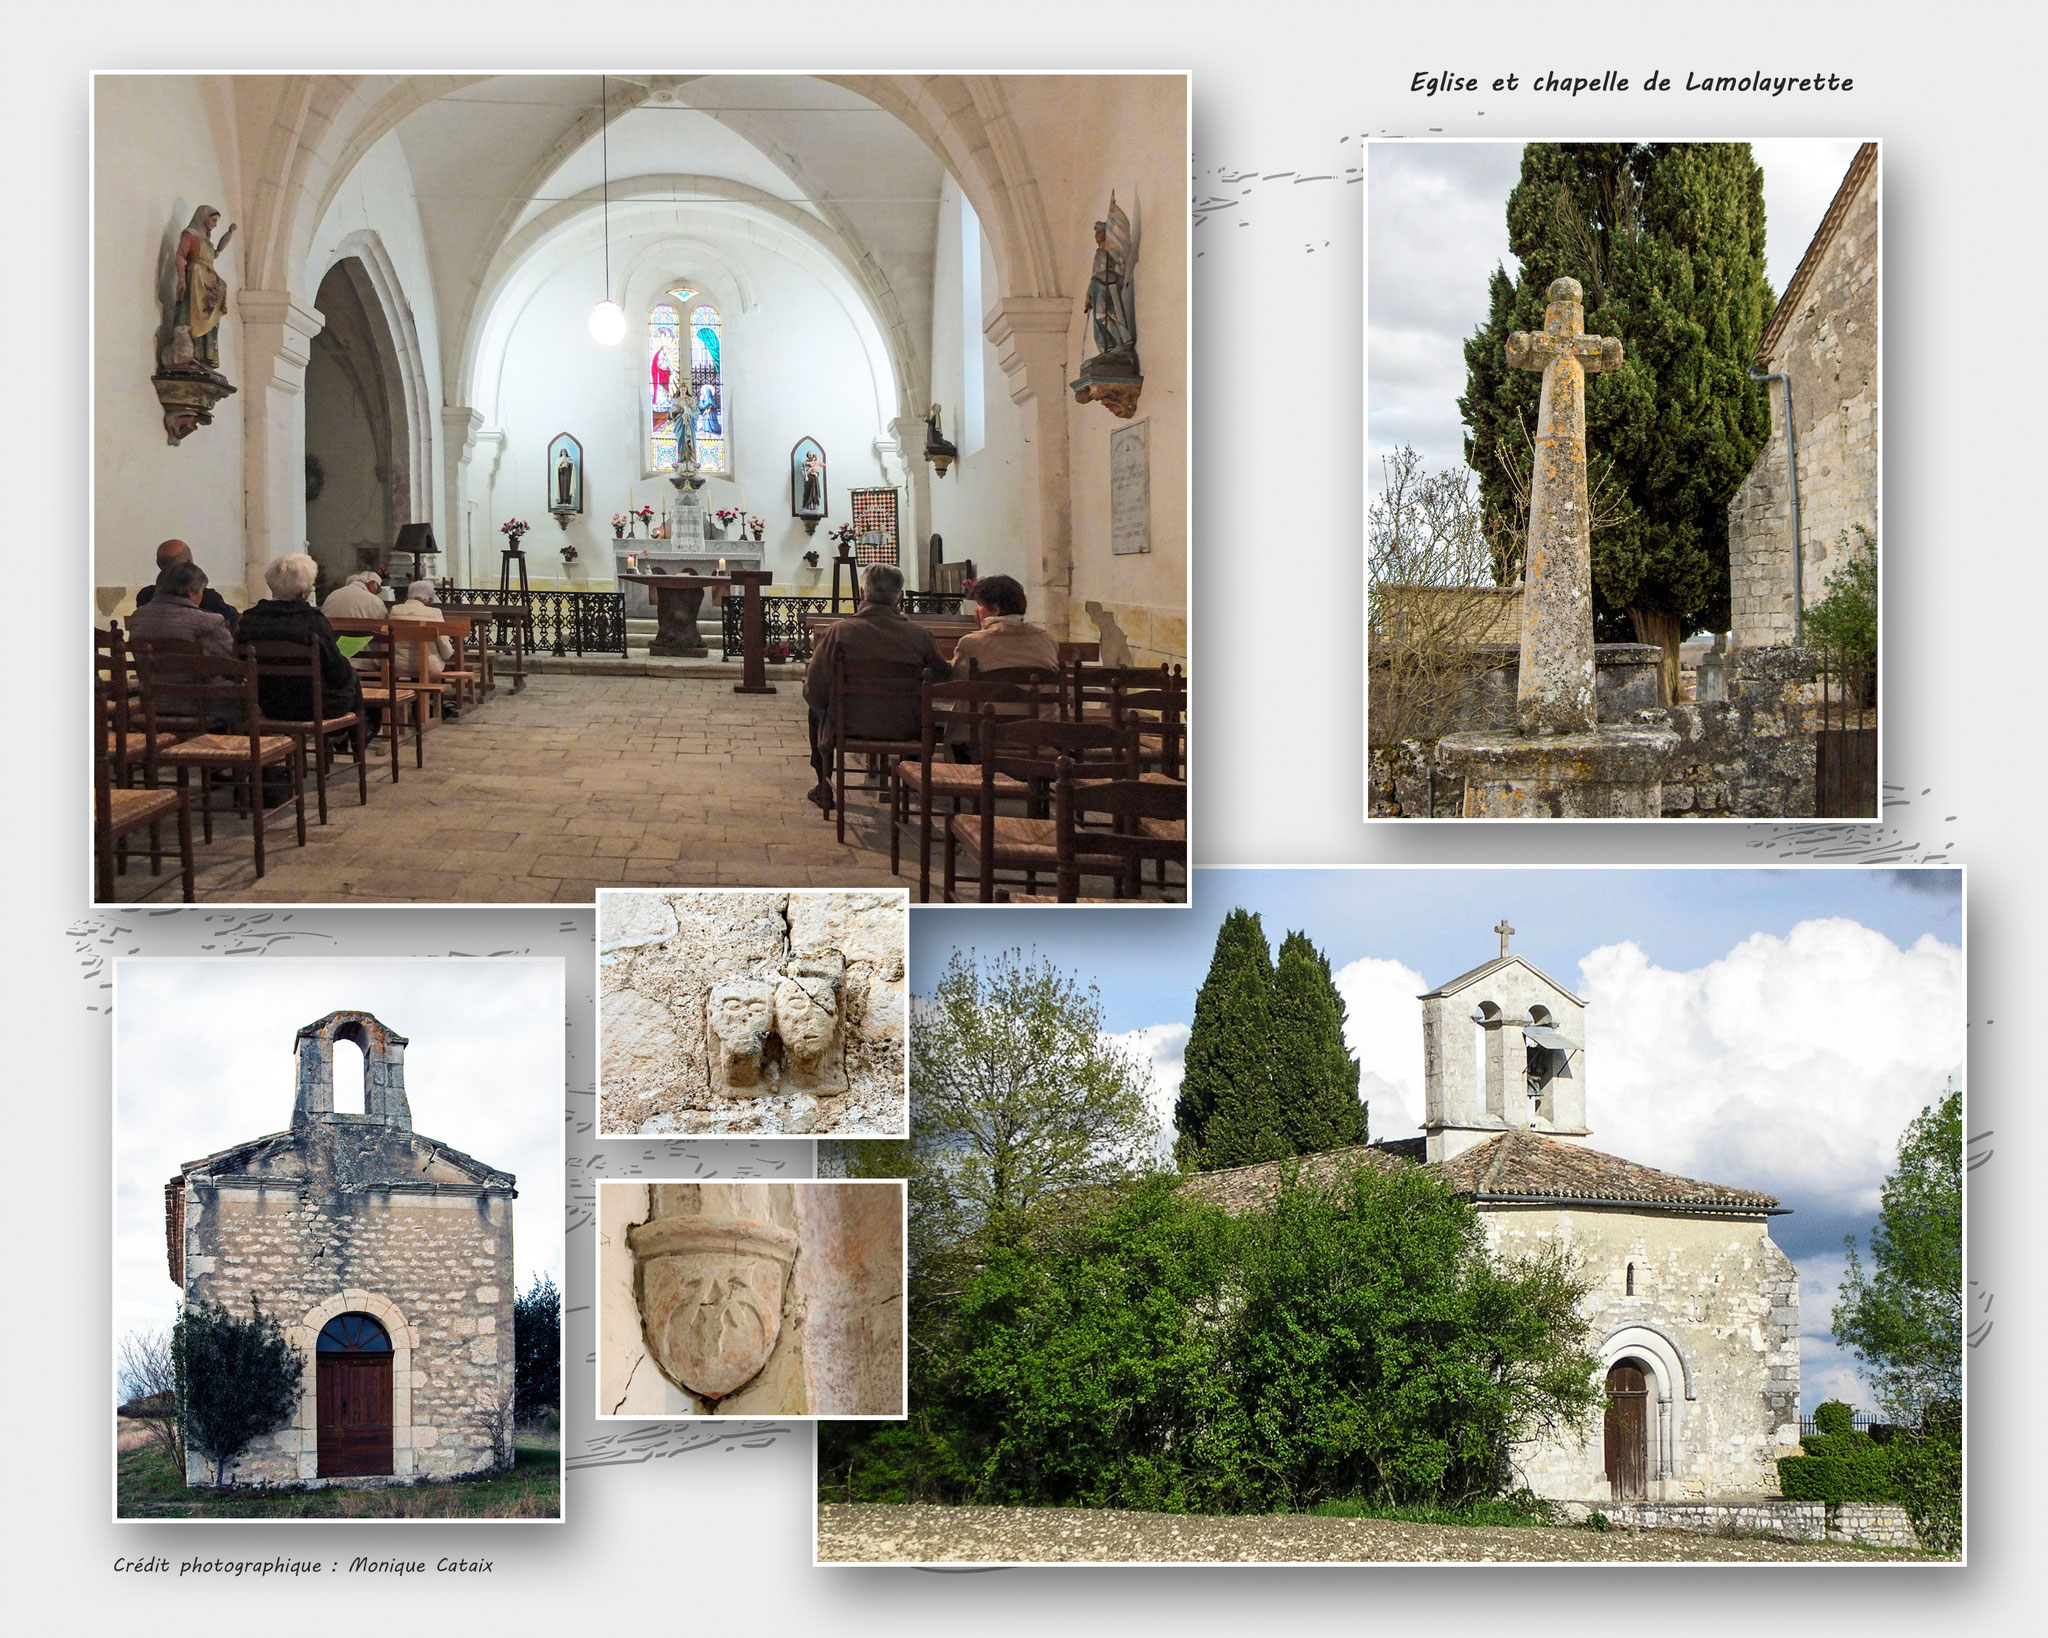 Eglise de Lamolayrette